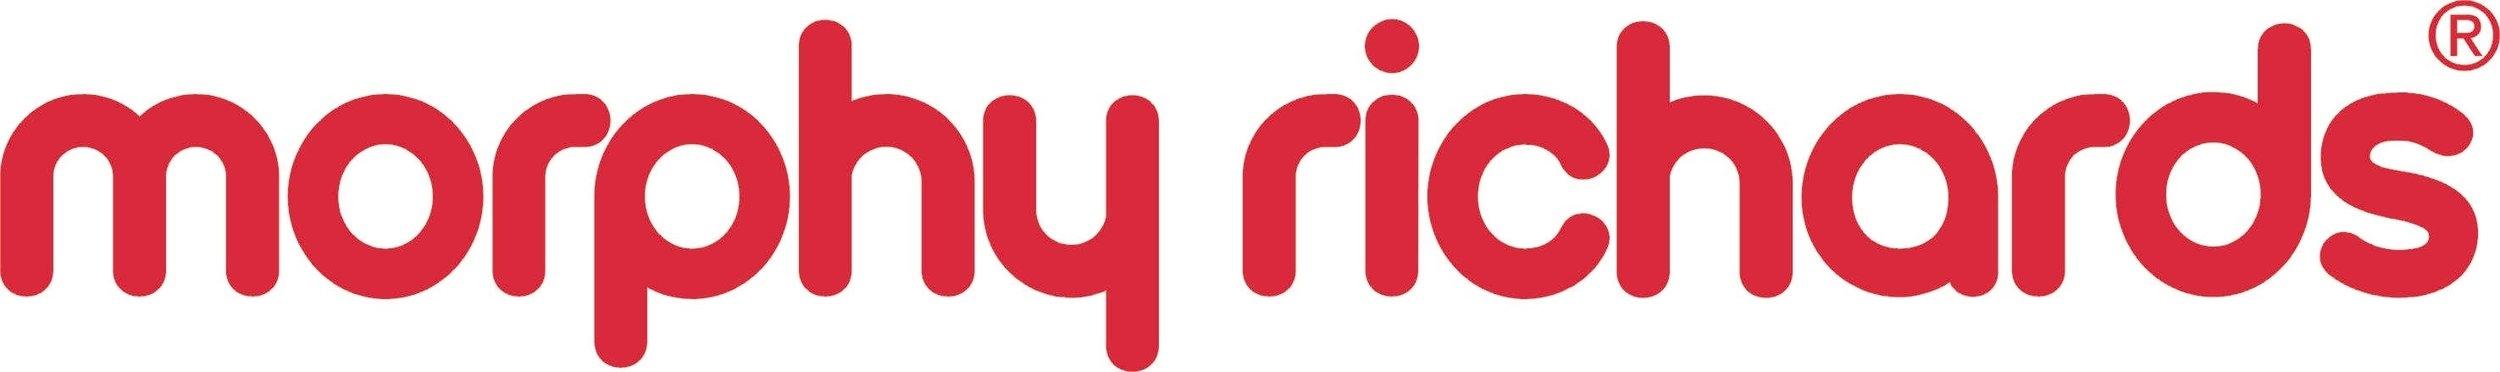 morphy-richards-logo.jpg